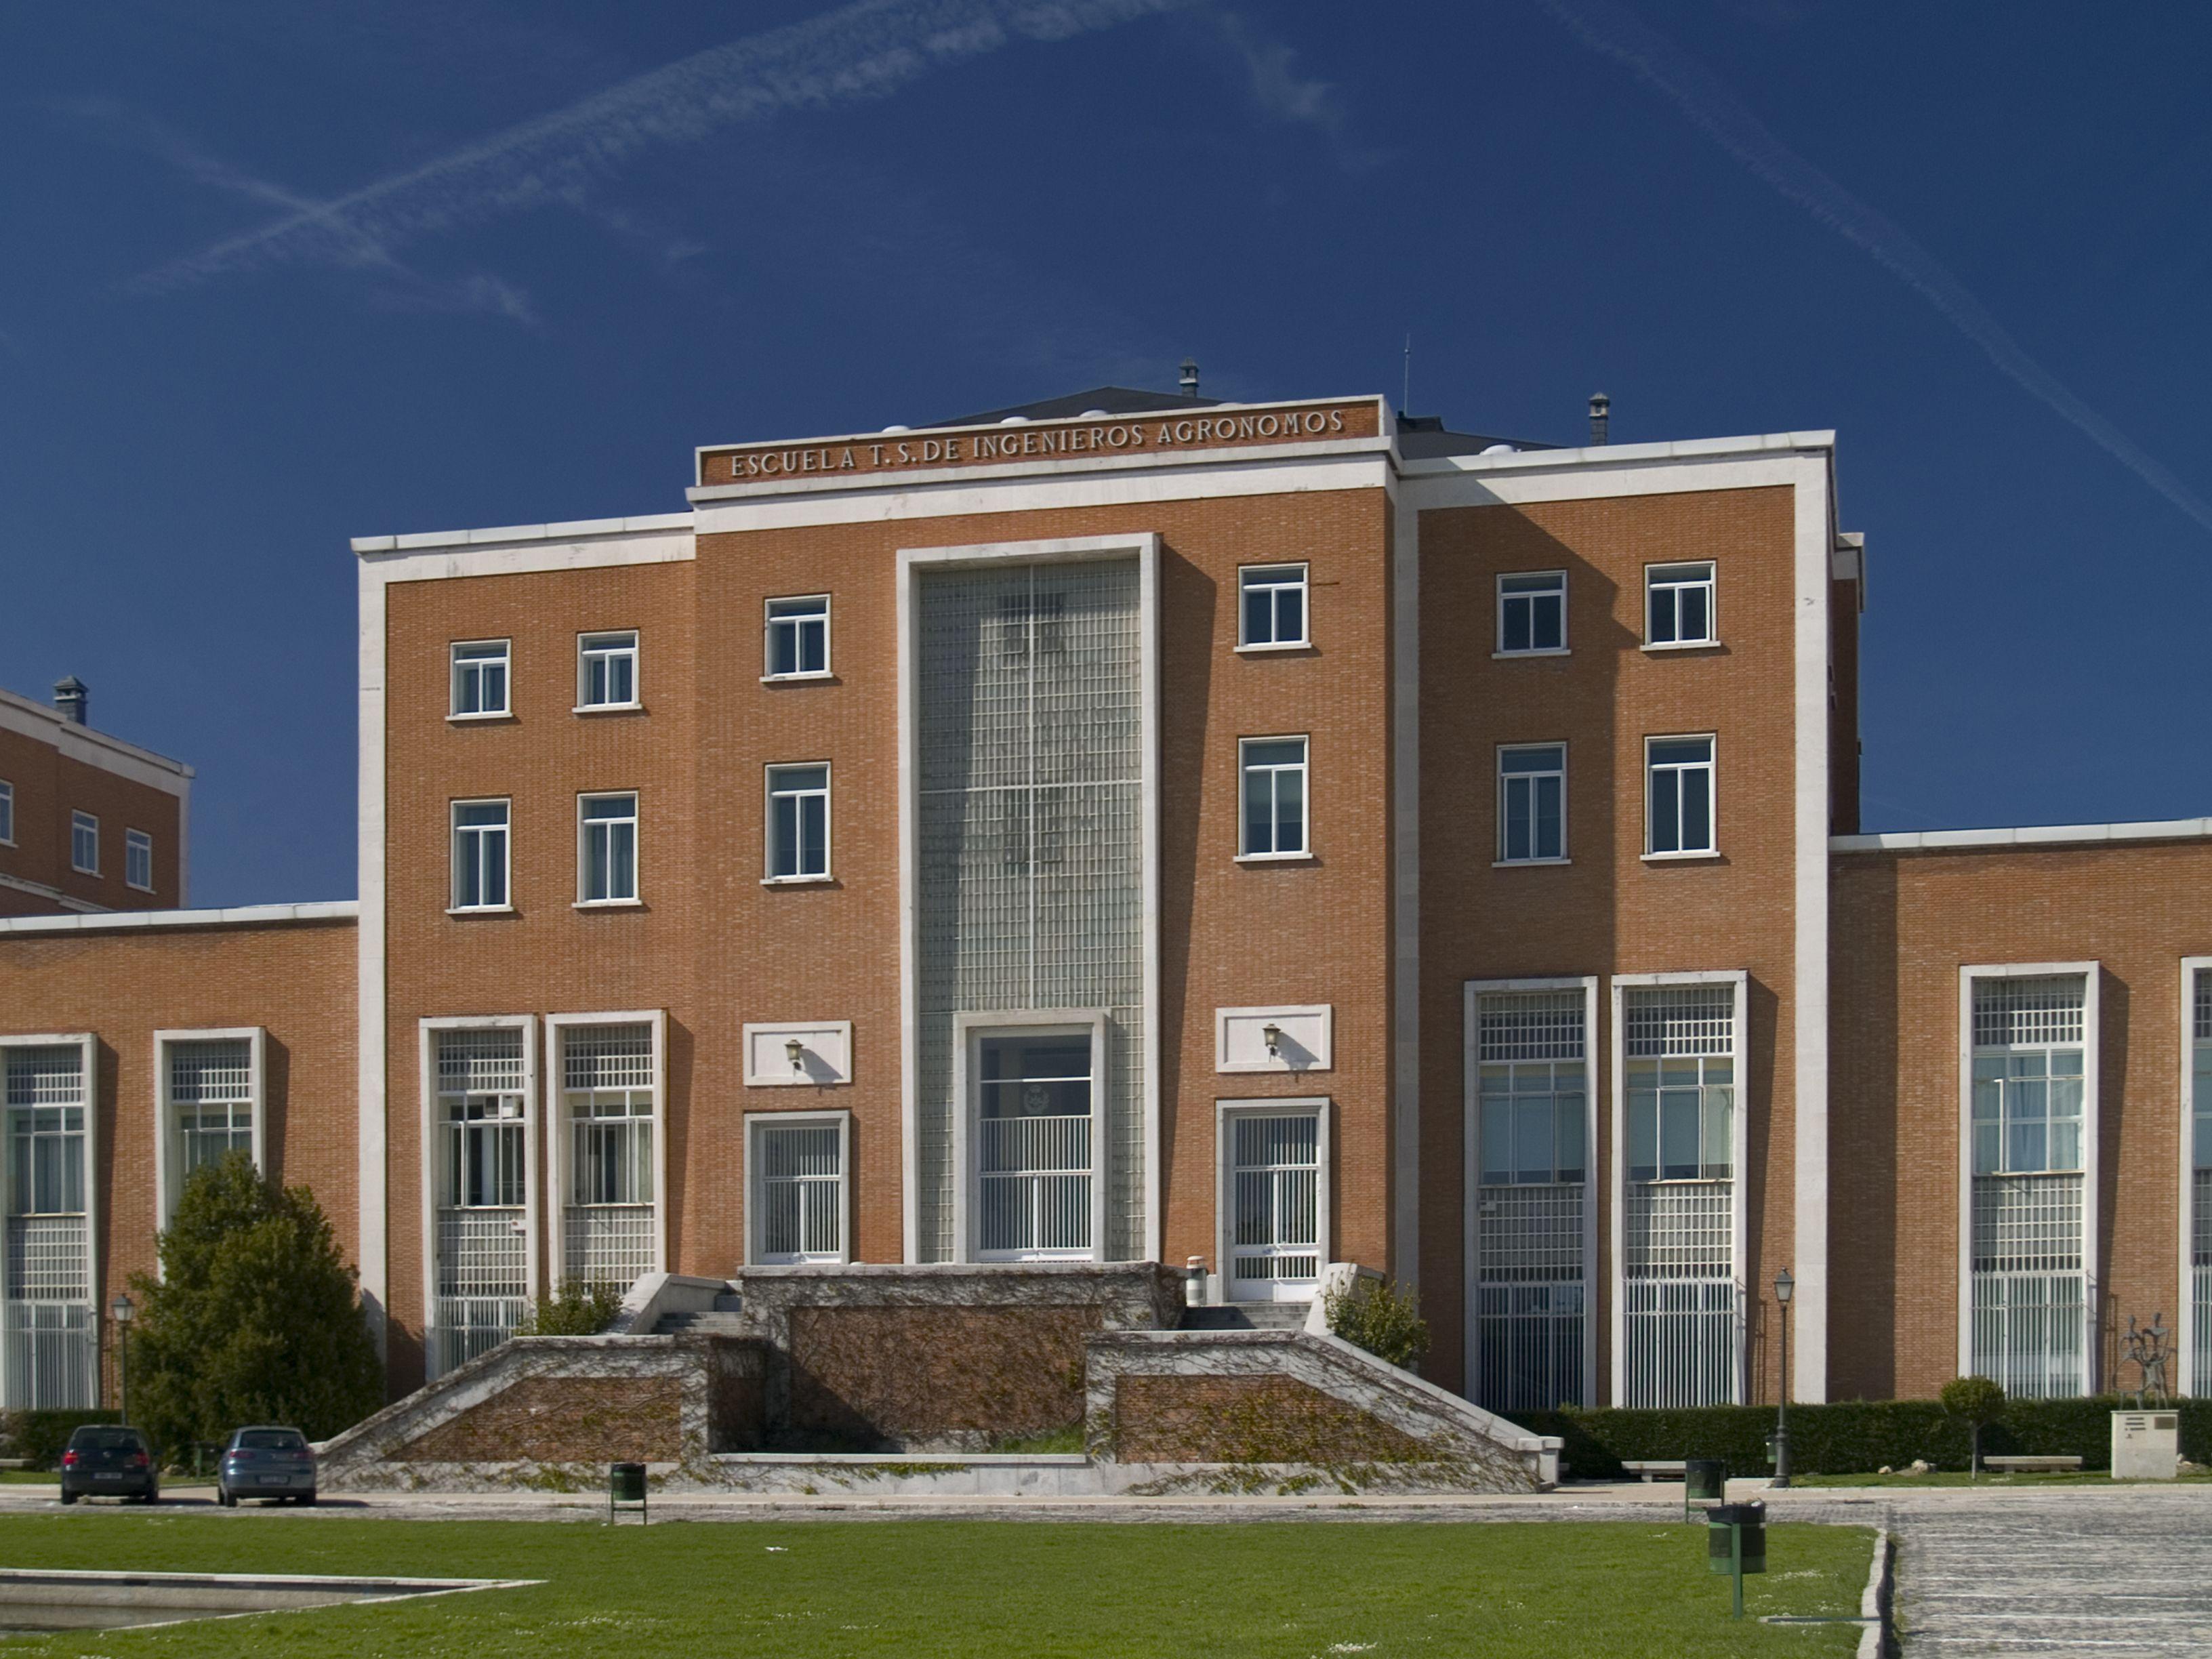 Escuela t cnica superior de ingenieros agr nomos de la for Universidad complutense de madrid arquitectura